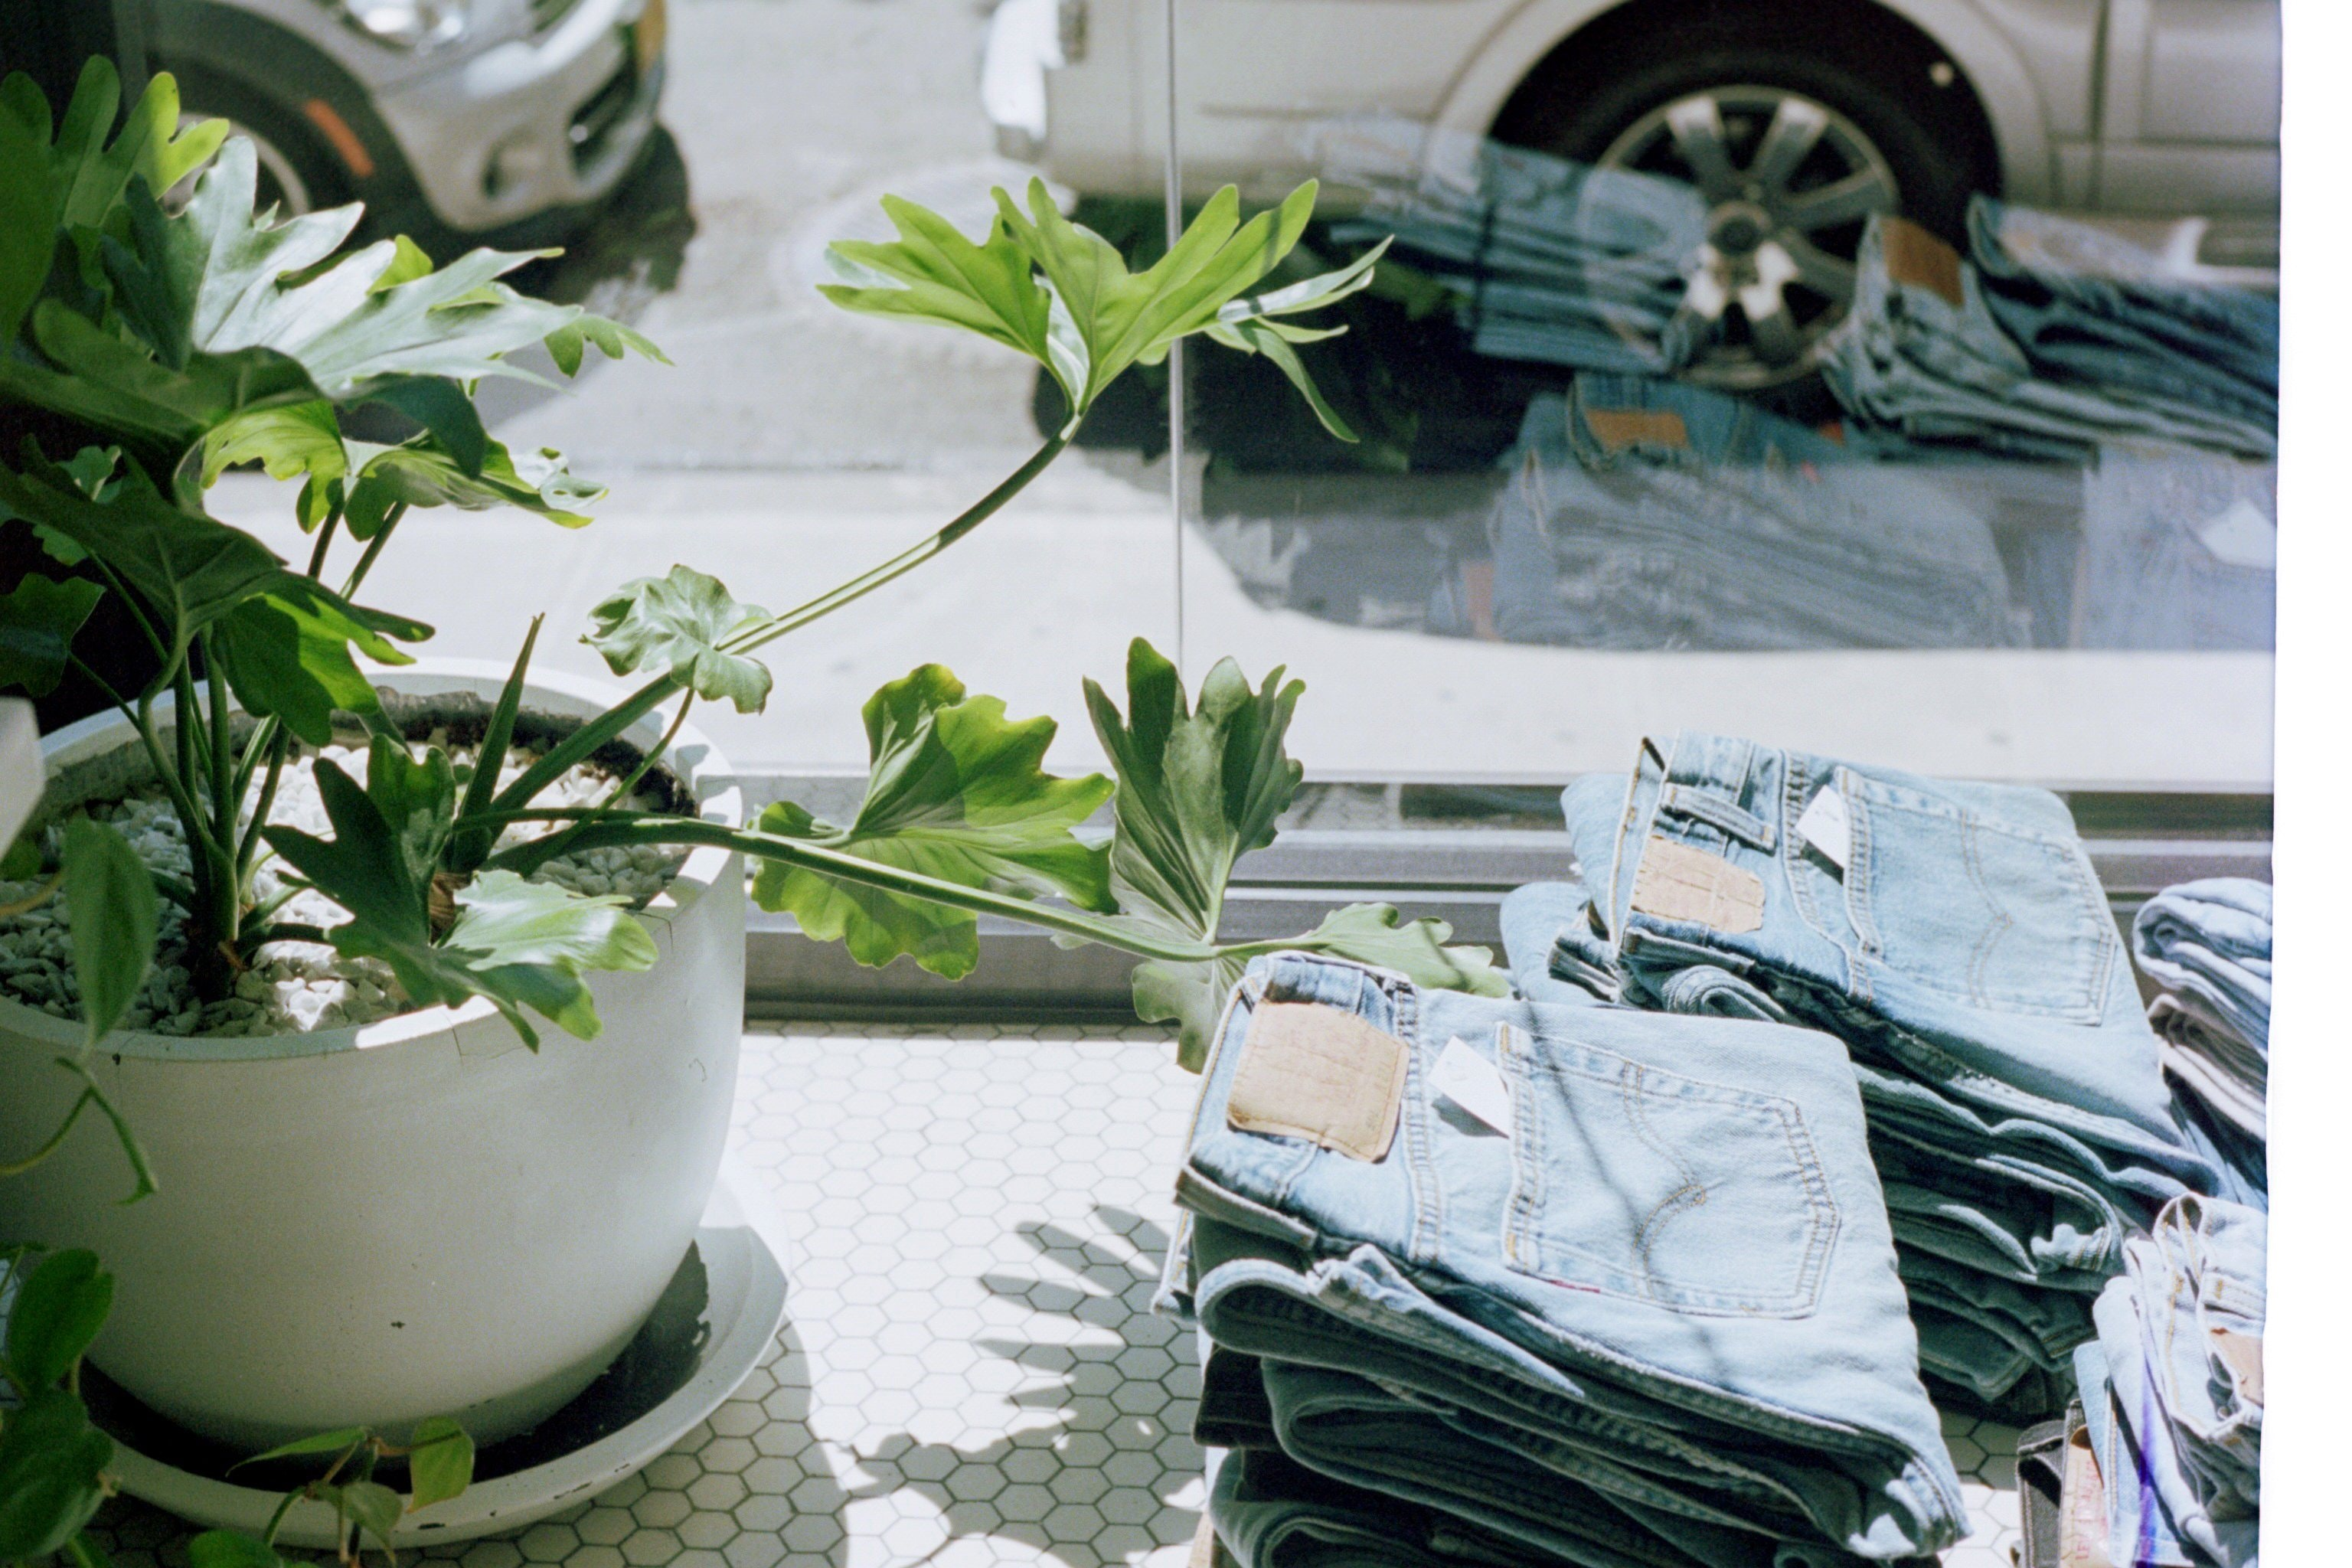 green leafed plant in white pot beside blue denim bottoms on table beside glass panel window